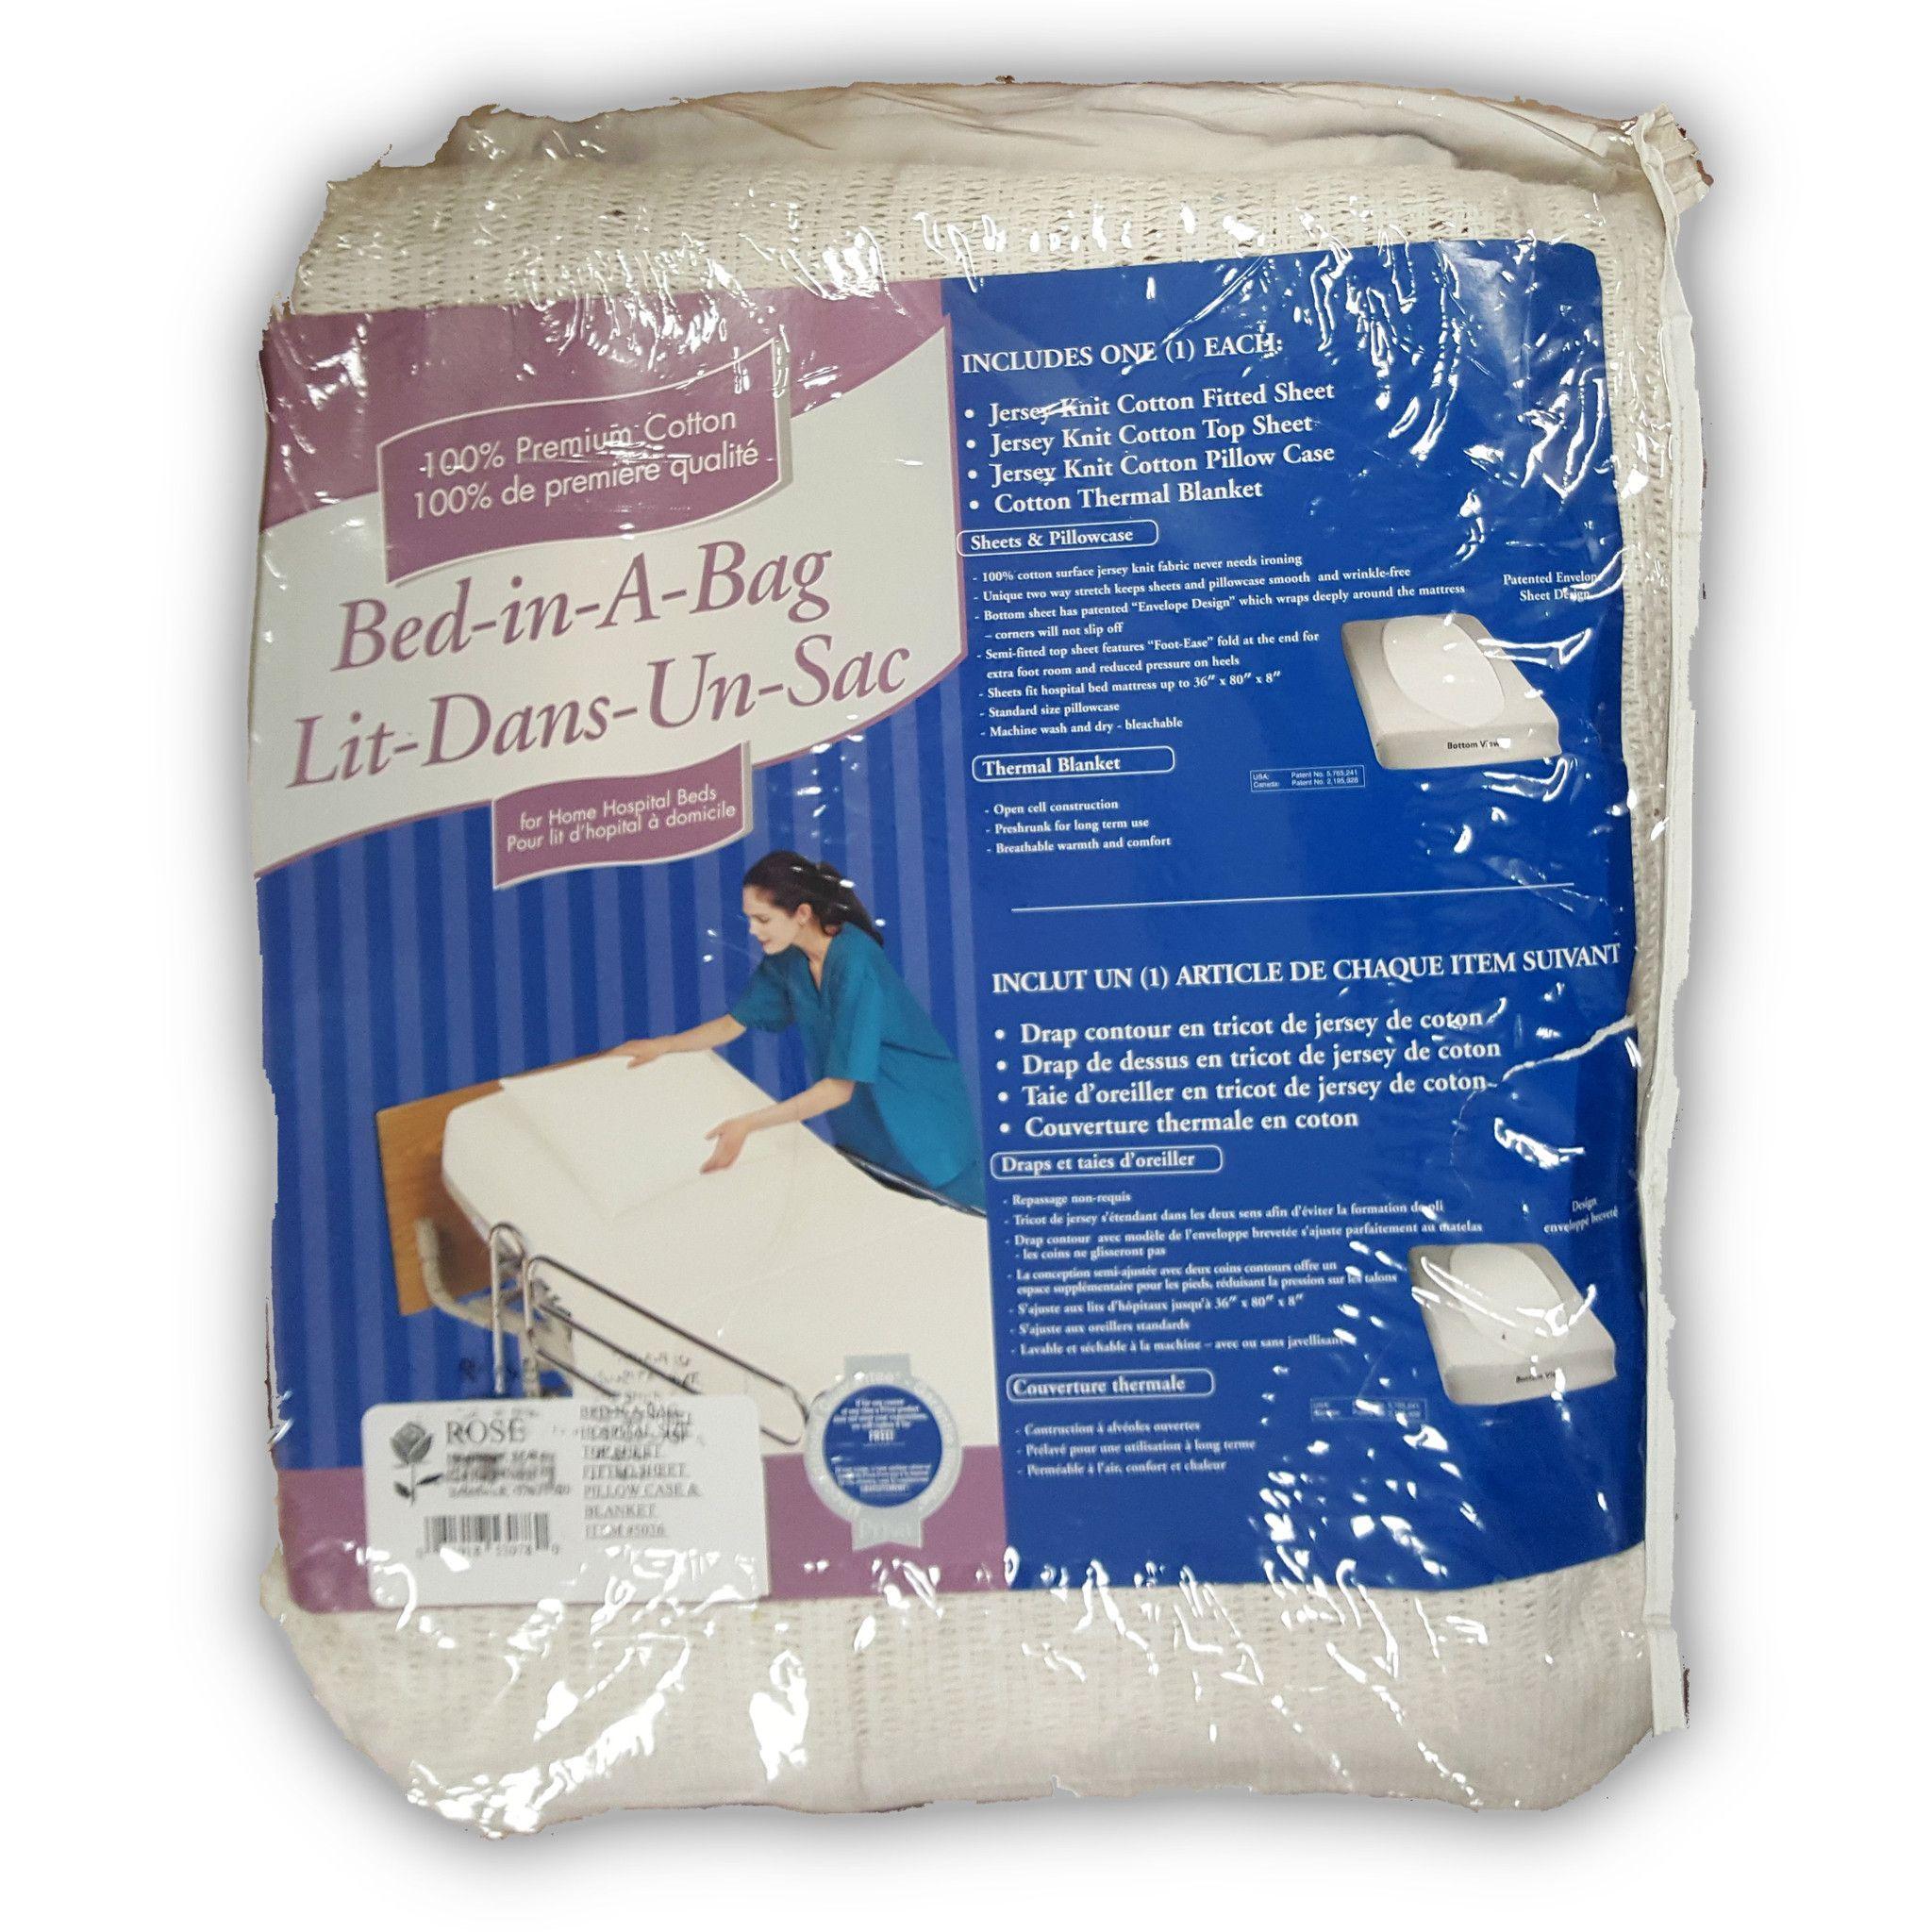 Cotton Bed-In-A-Bag Blanket Sheet Kit for Home Hospital Beds   Rose  Healthcare